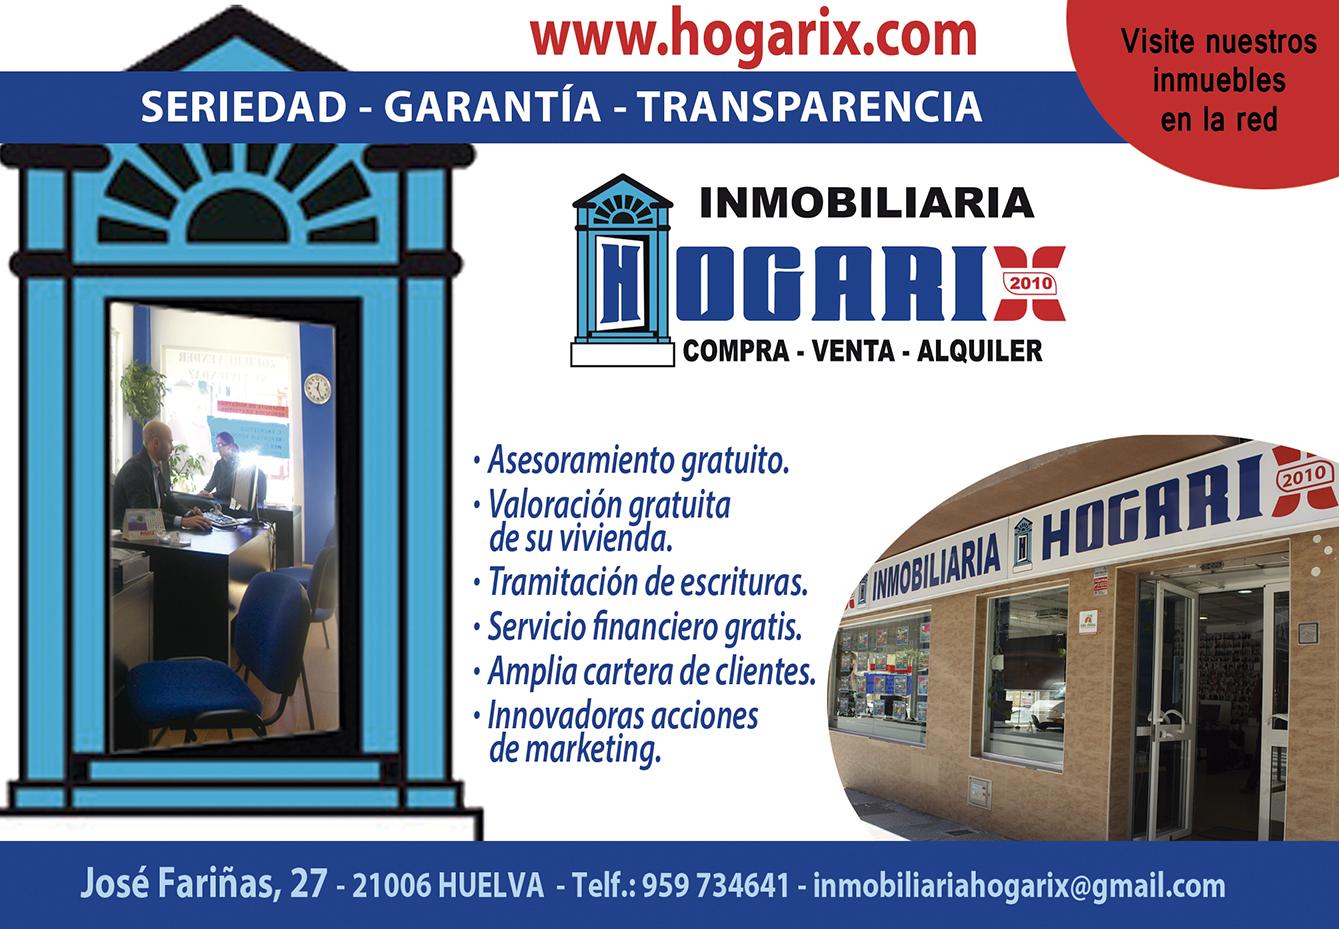 Hogarix media